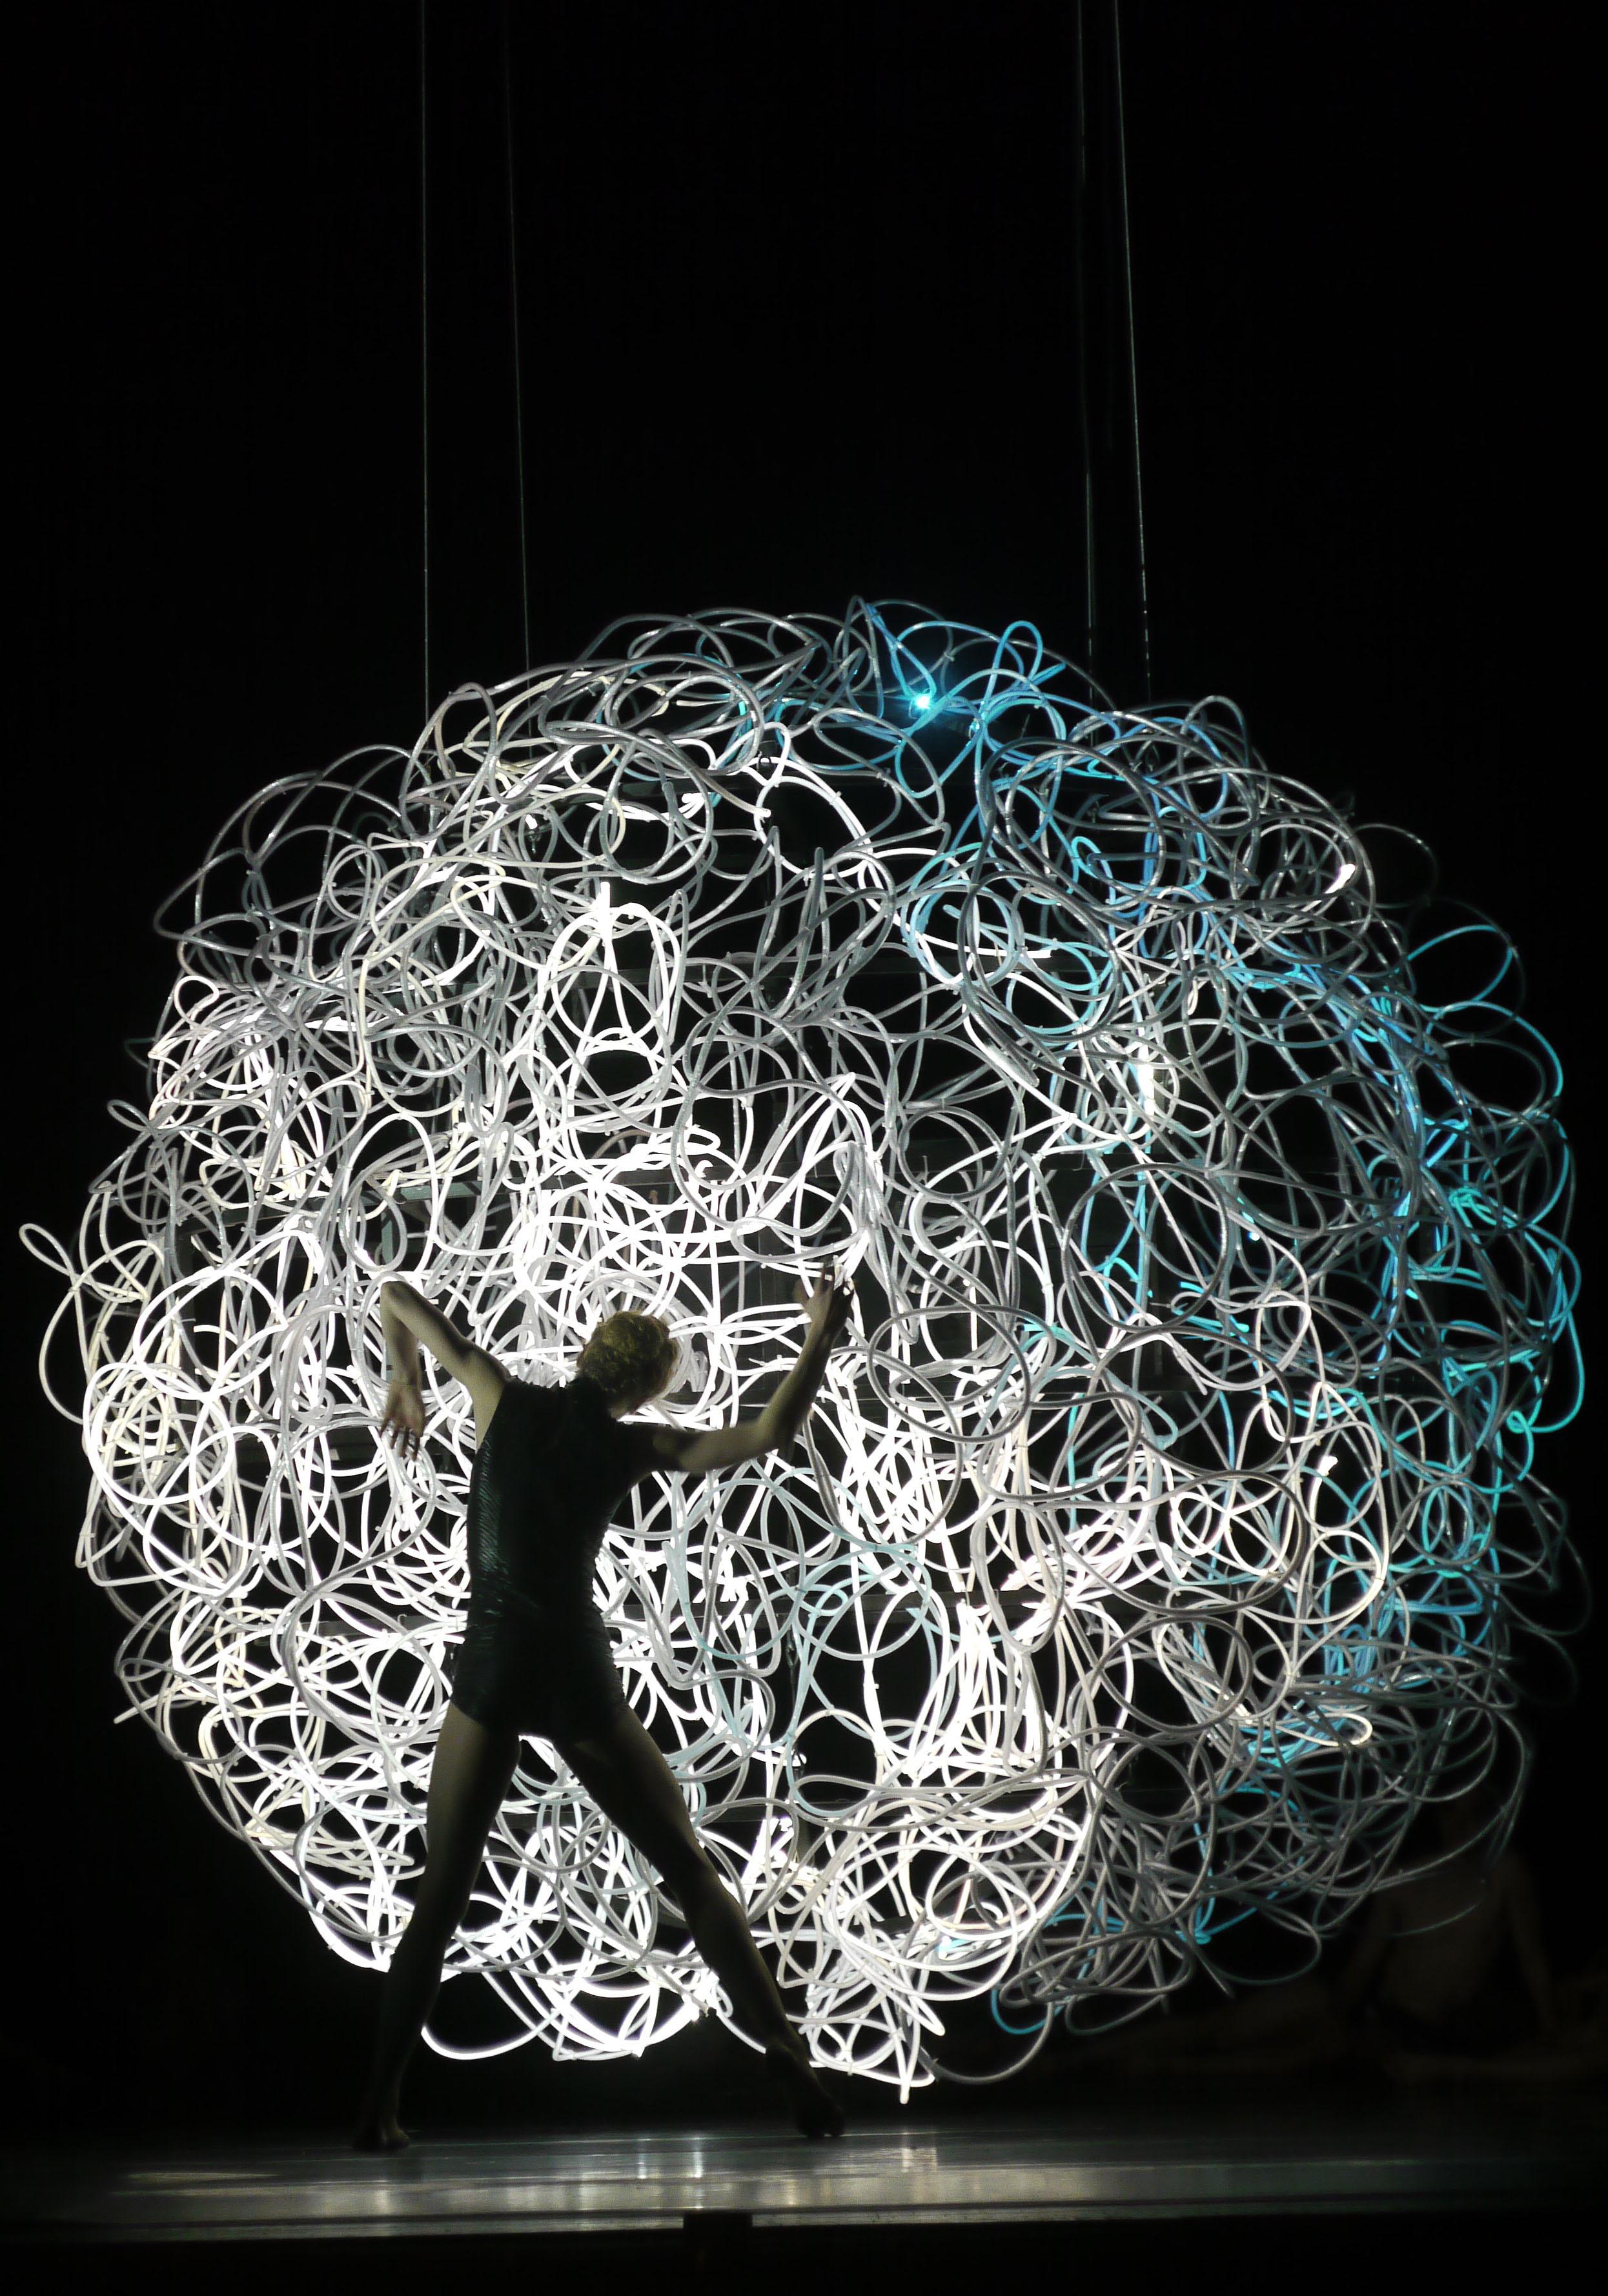 Sortir a Munich - Ballet et scènes de danse : Agenda 2013 5